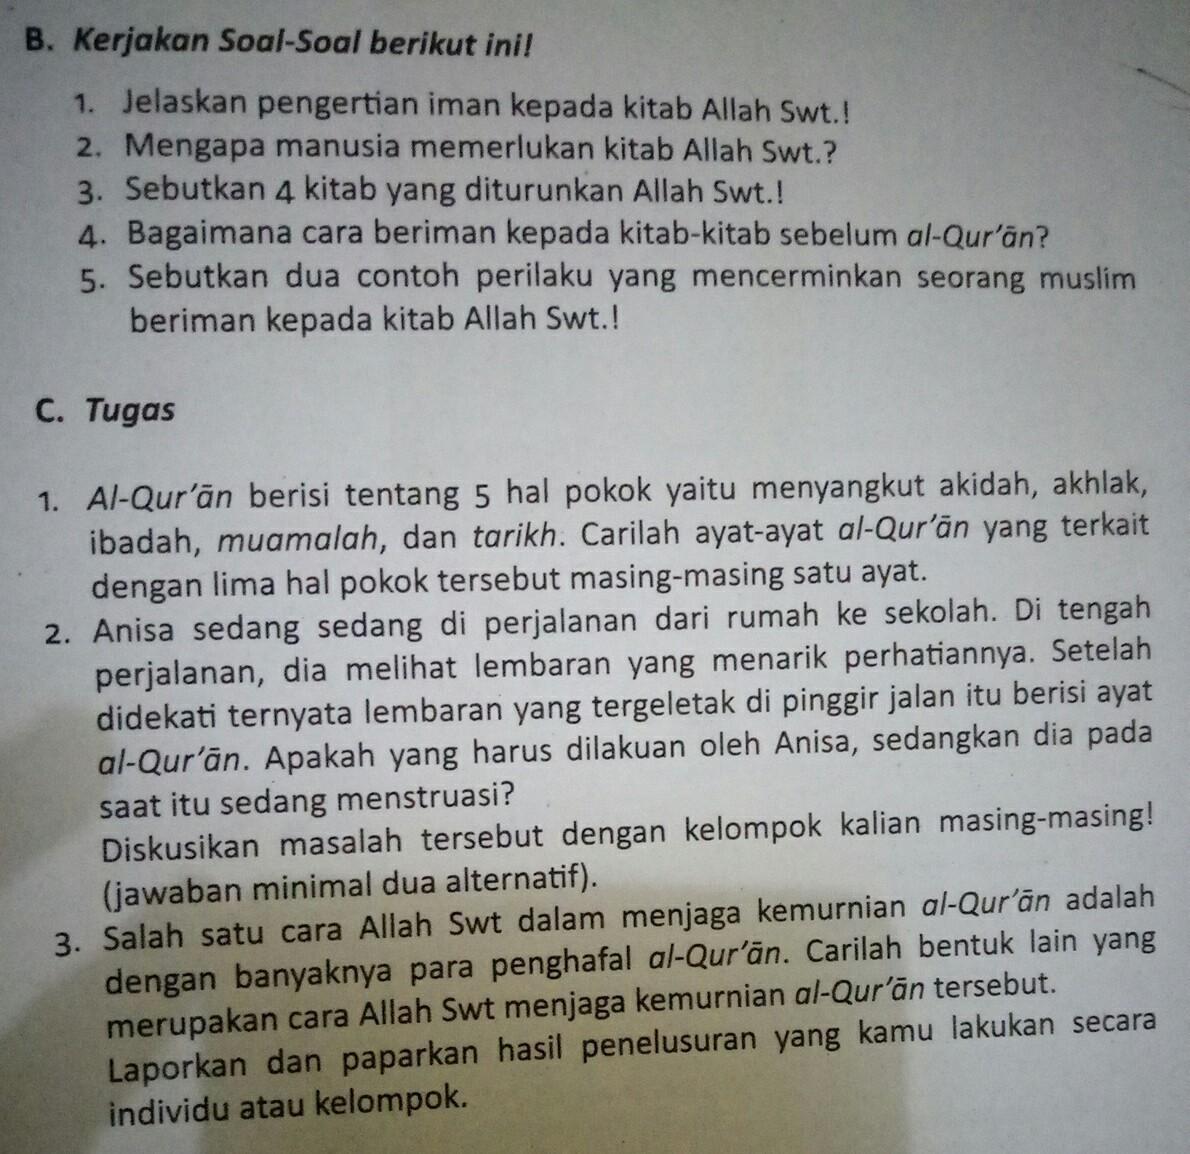 Sebutkan 2 Contoh Perilaku Yang Mencerminkan Seorang Muslim ...